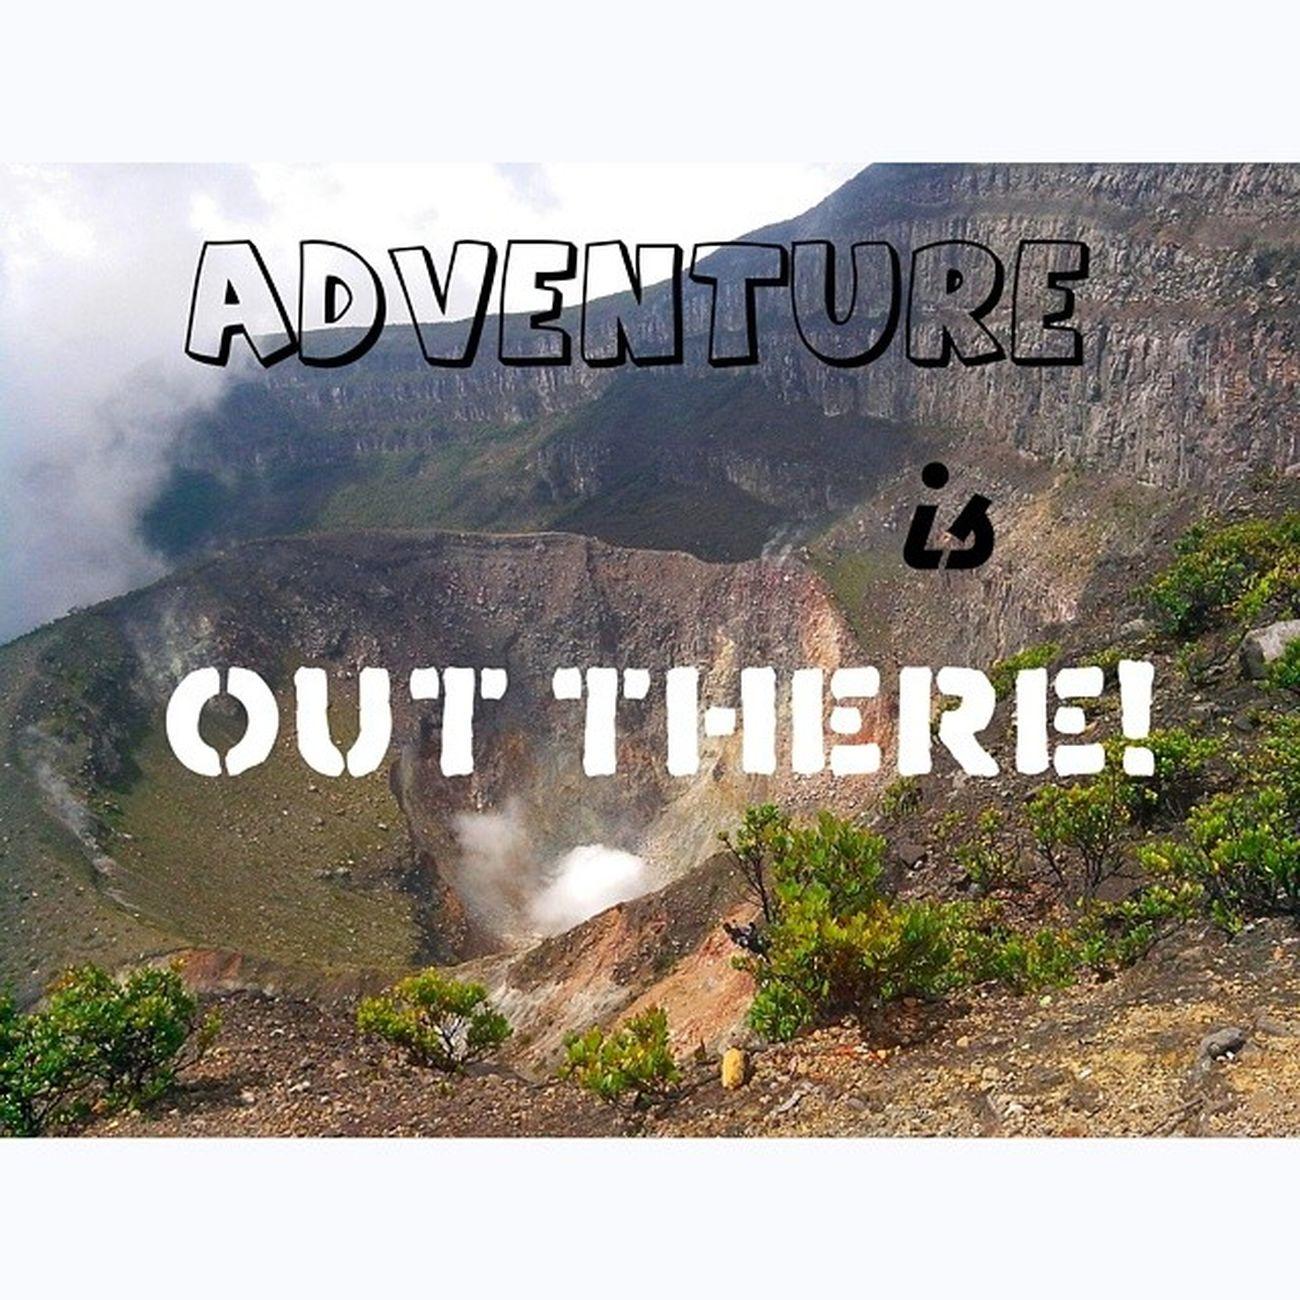 Adventure Quotes Tnggp Instatravel instalike gngede